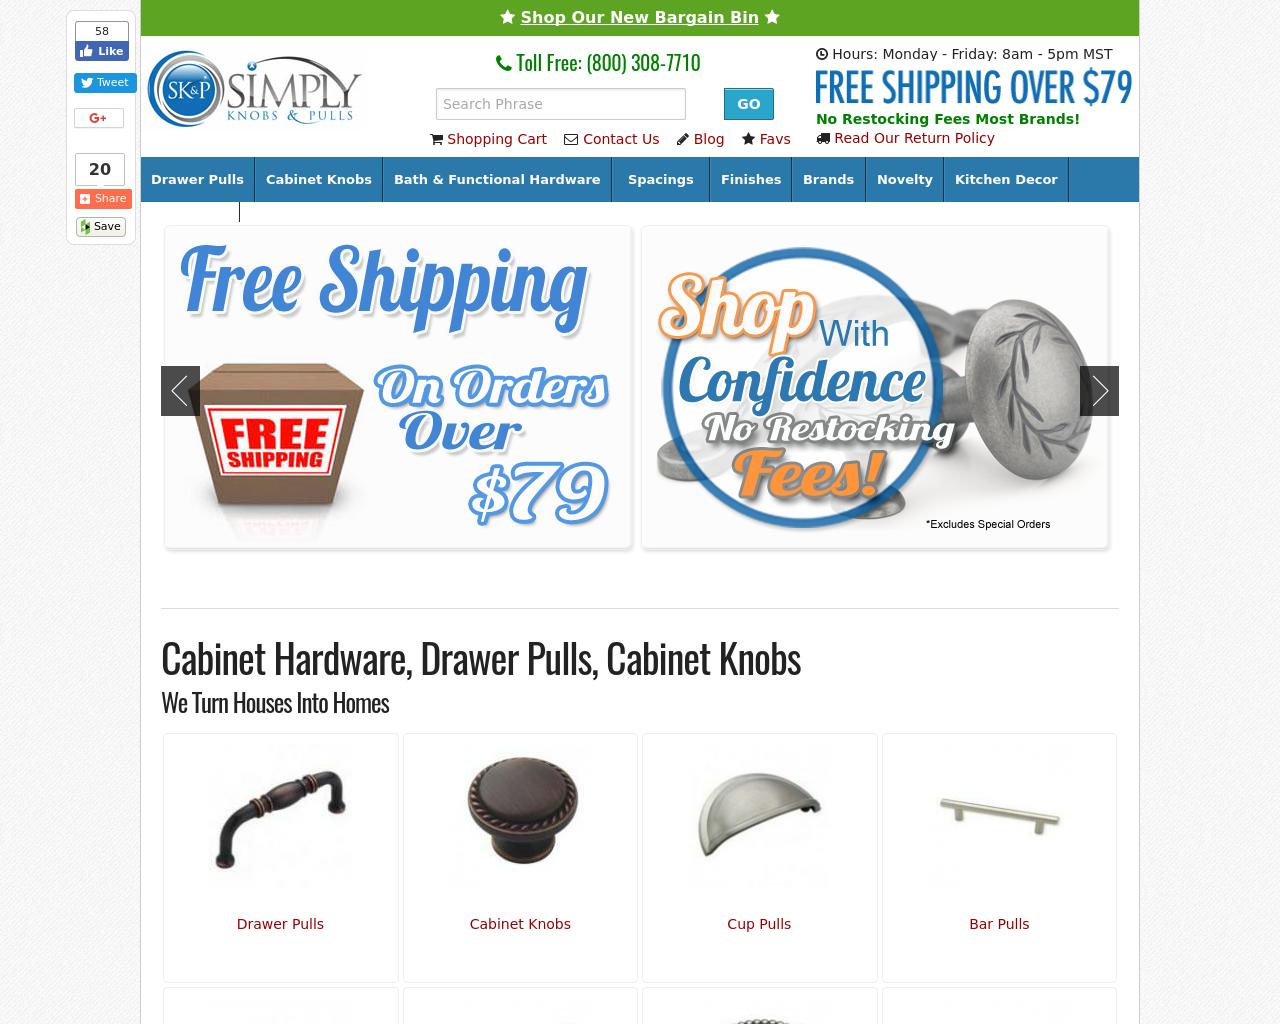 Simplyknobsandpulls-Advertising-Reviews-Pricing